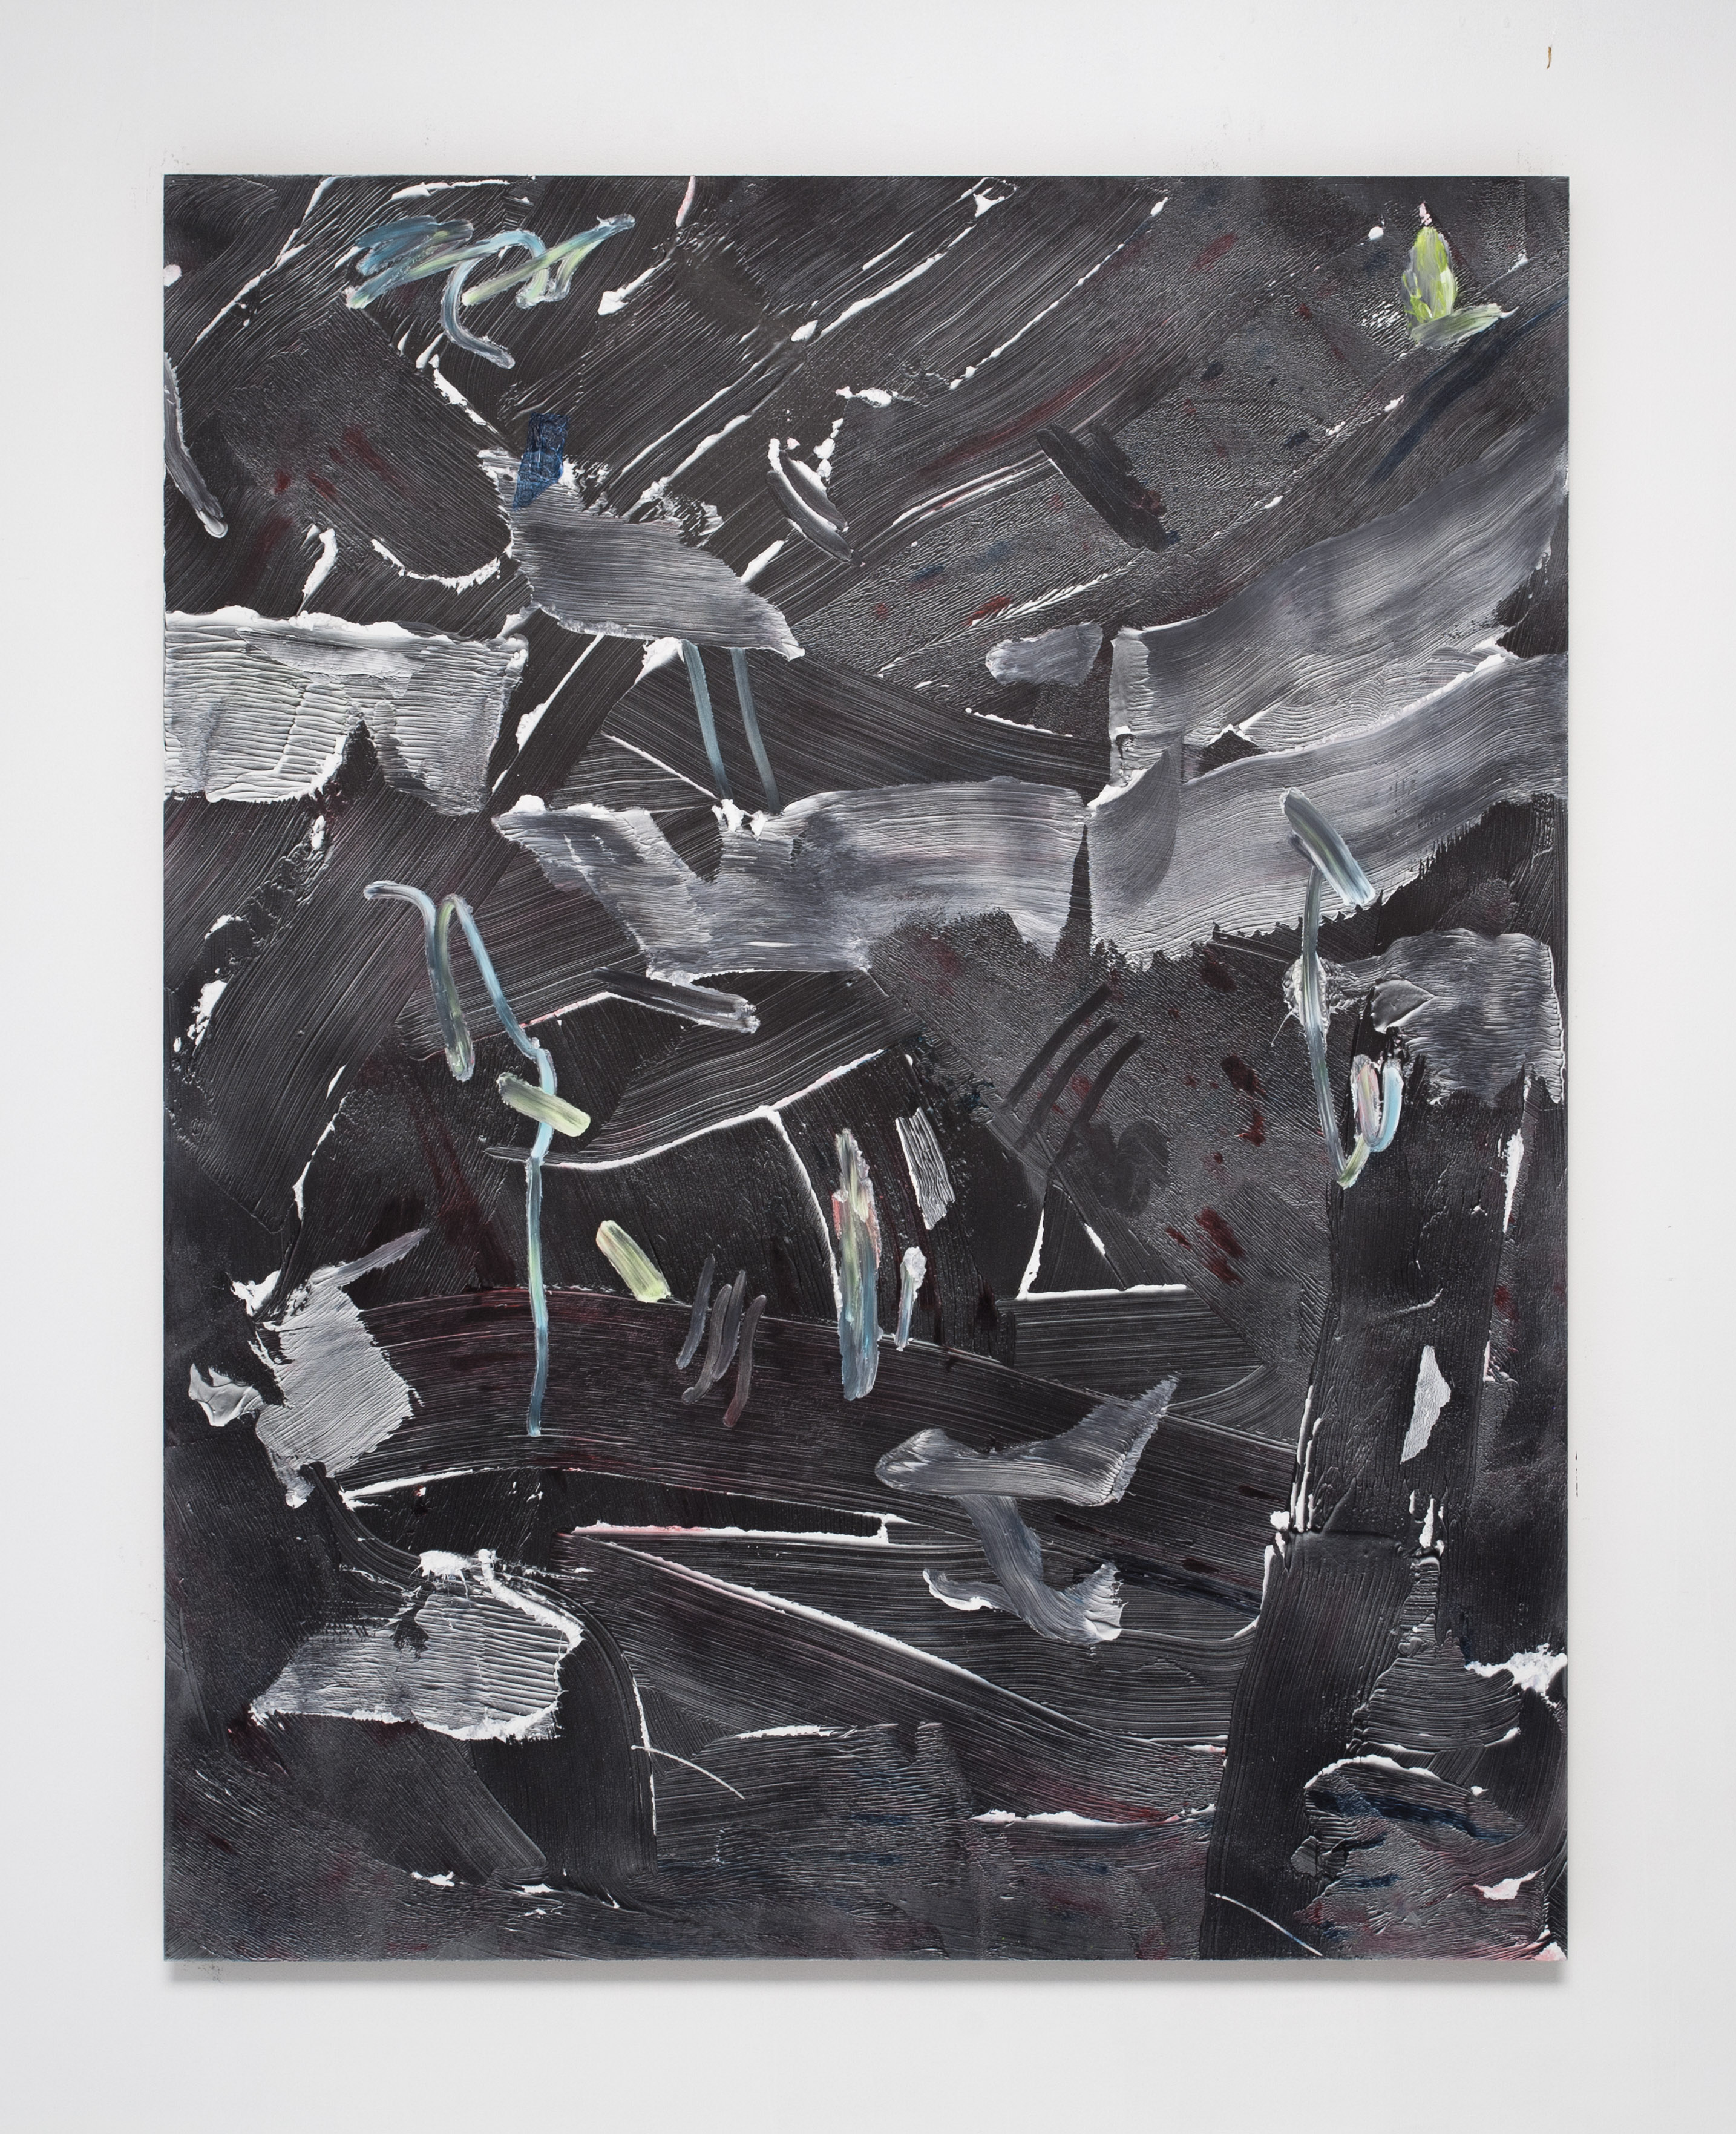 Joe Reihsen, _IMG_0270_, 2013, Acrylic on panel, aluminum frame, 60 x 47 inches